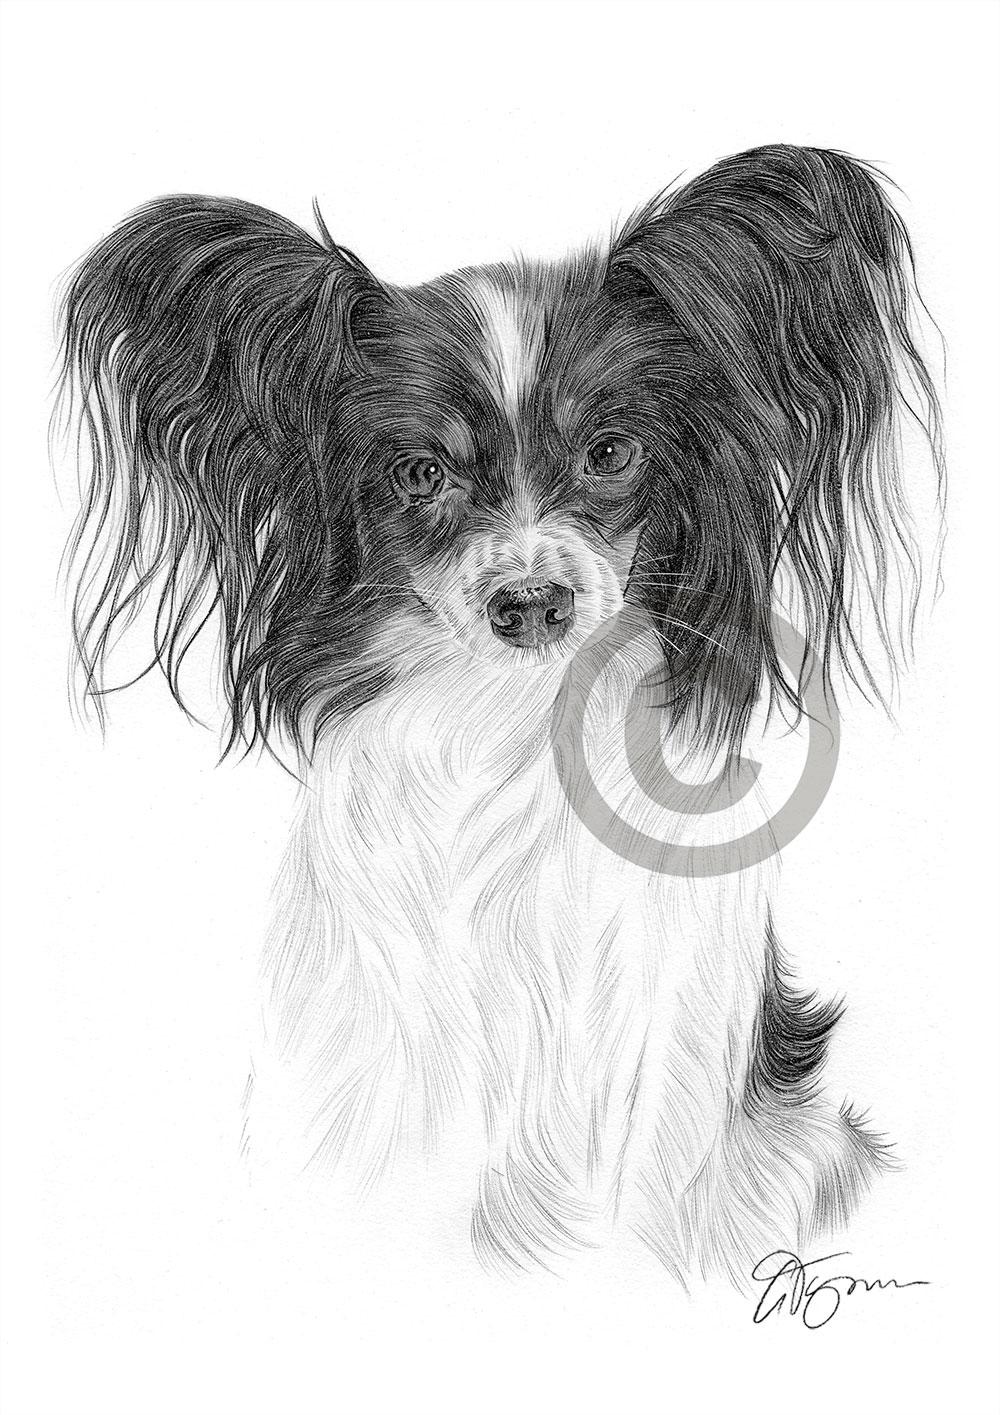 Dog PAPILLON pencil drawing art A4 size by UK artist Pet ...